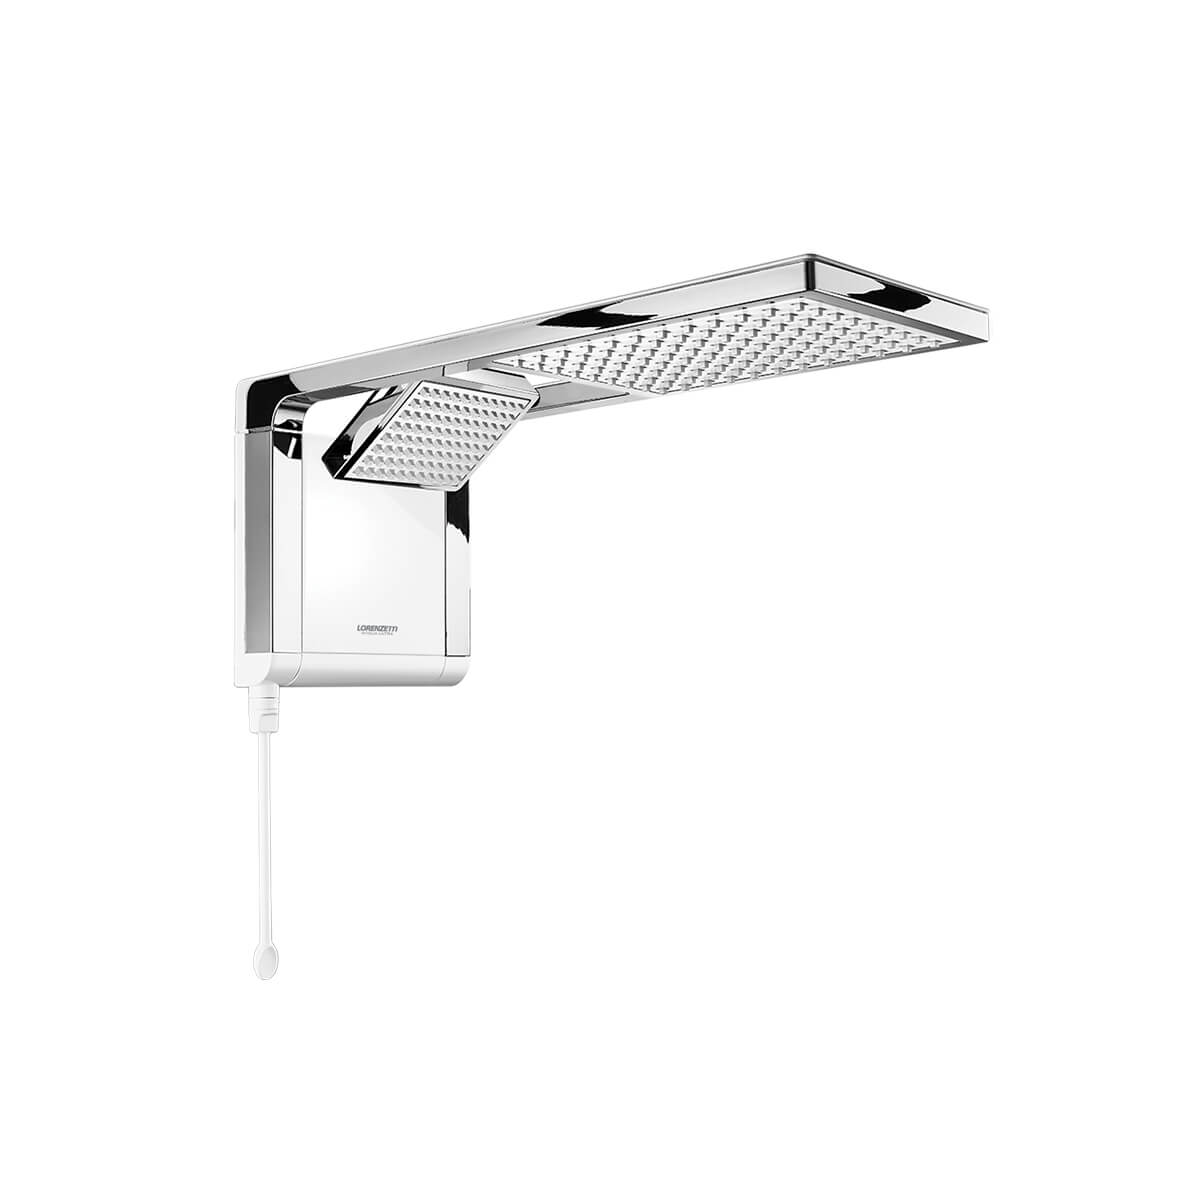 Chuveiro Acqua Duo Ultra Eletrônica 220V 7800W Lorenzetti - Branco/Cromado